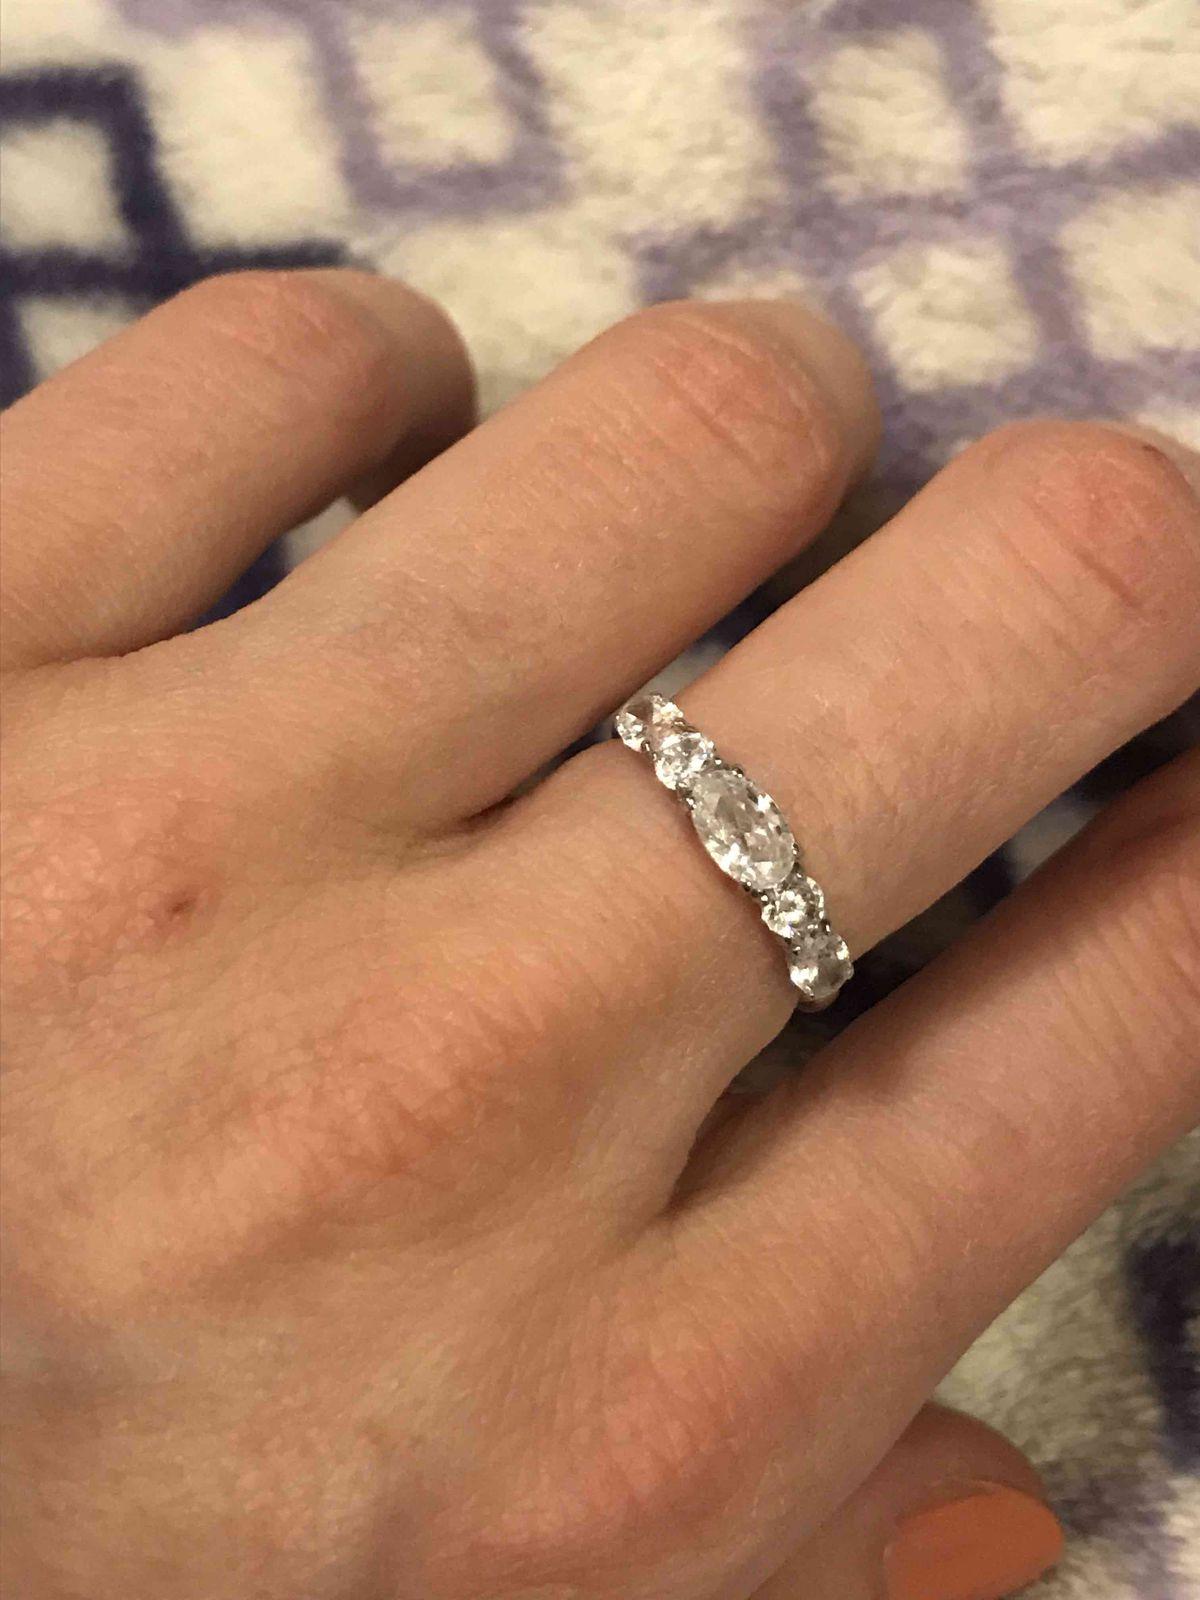 Идеальное кольцо за свою цену!